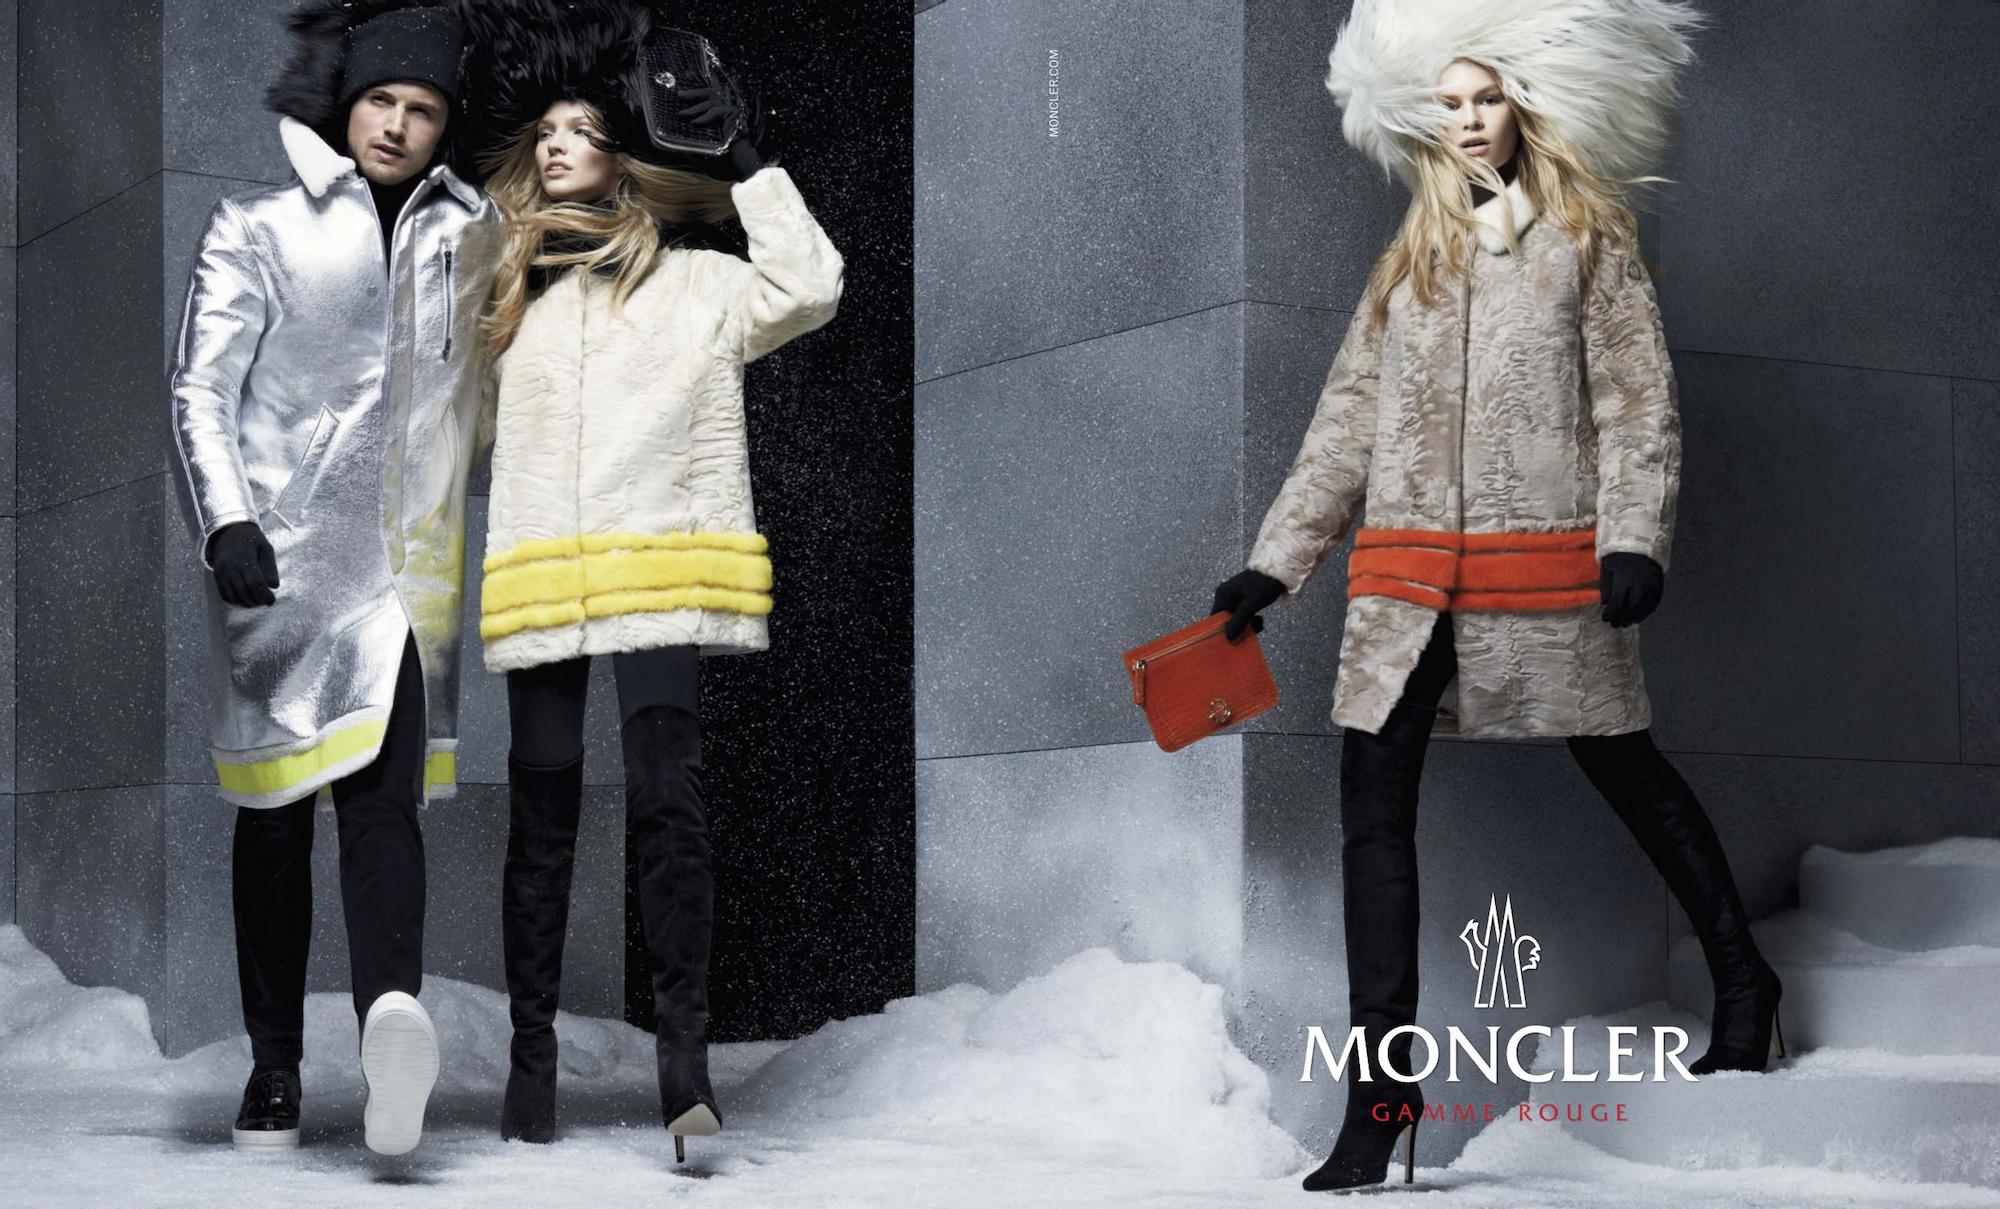 moncler ad 2015